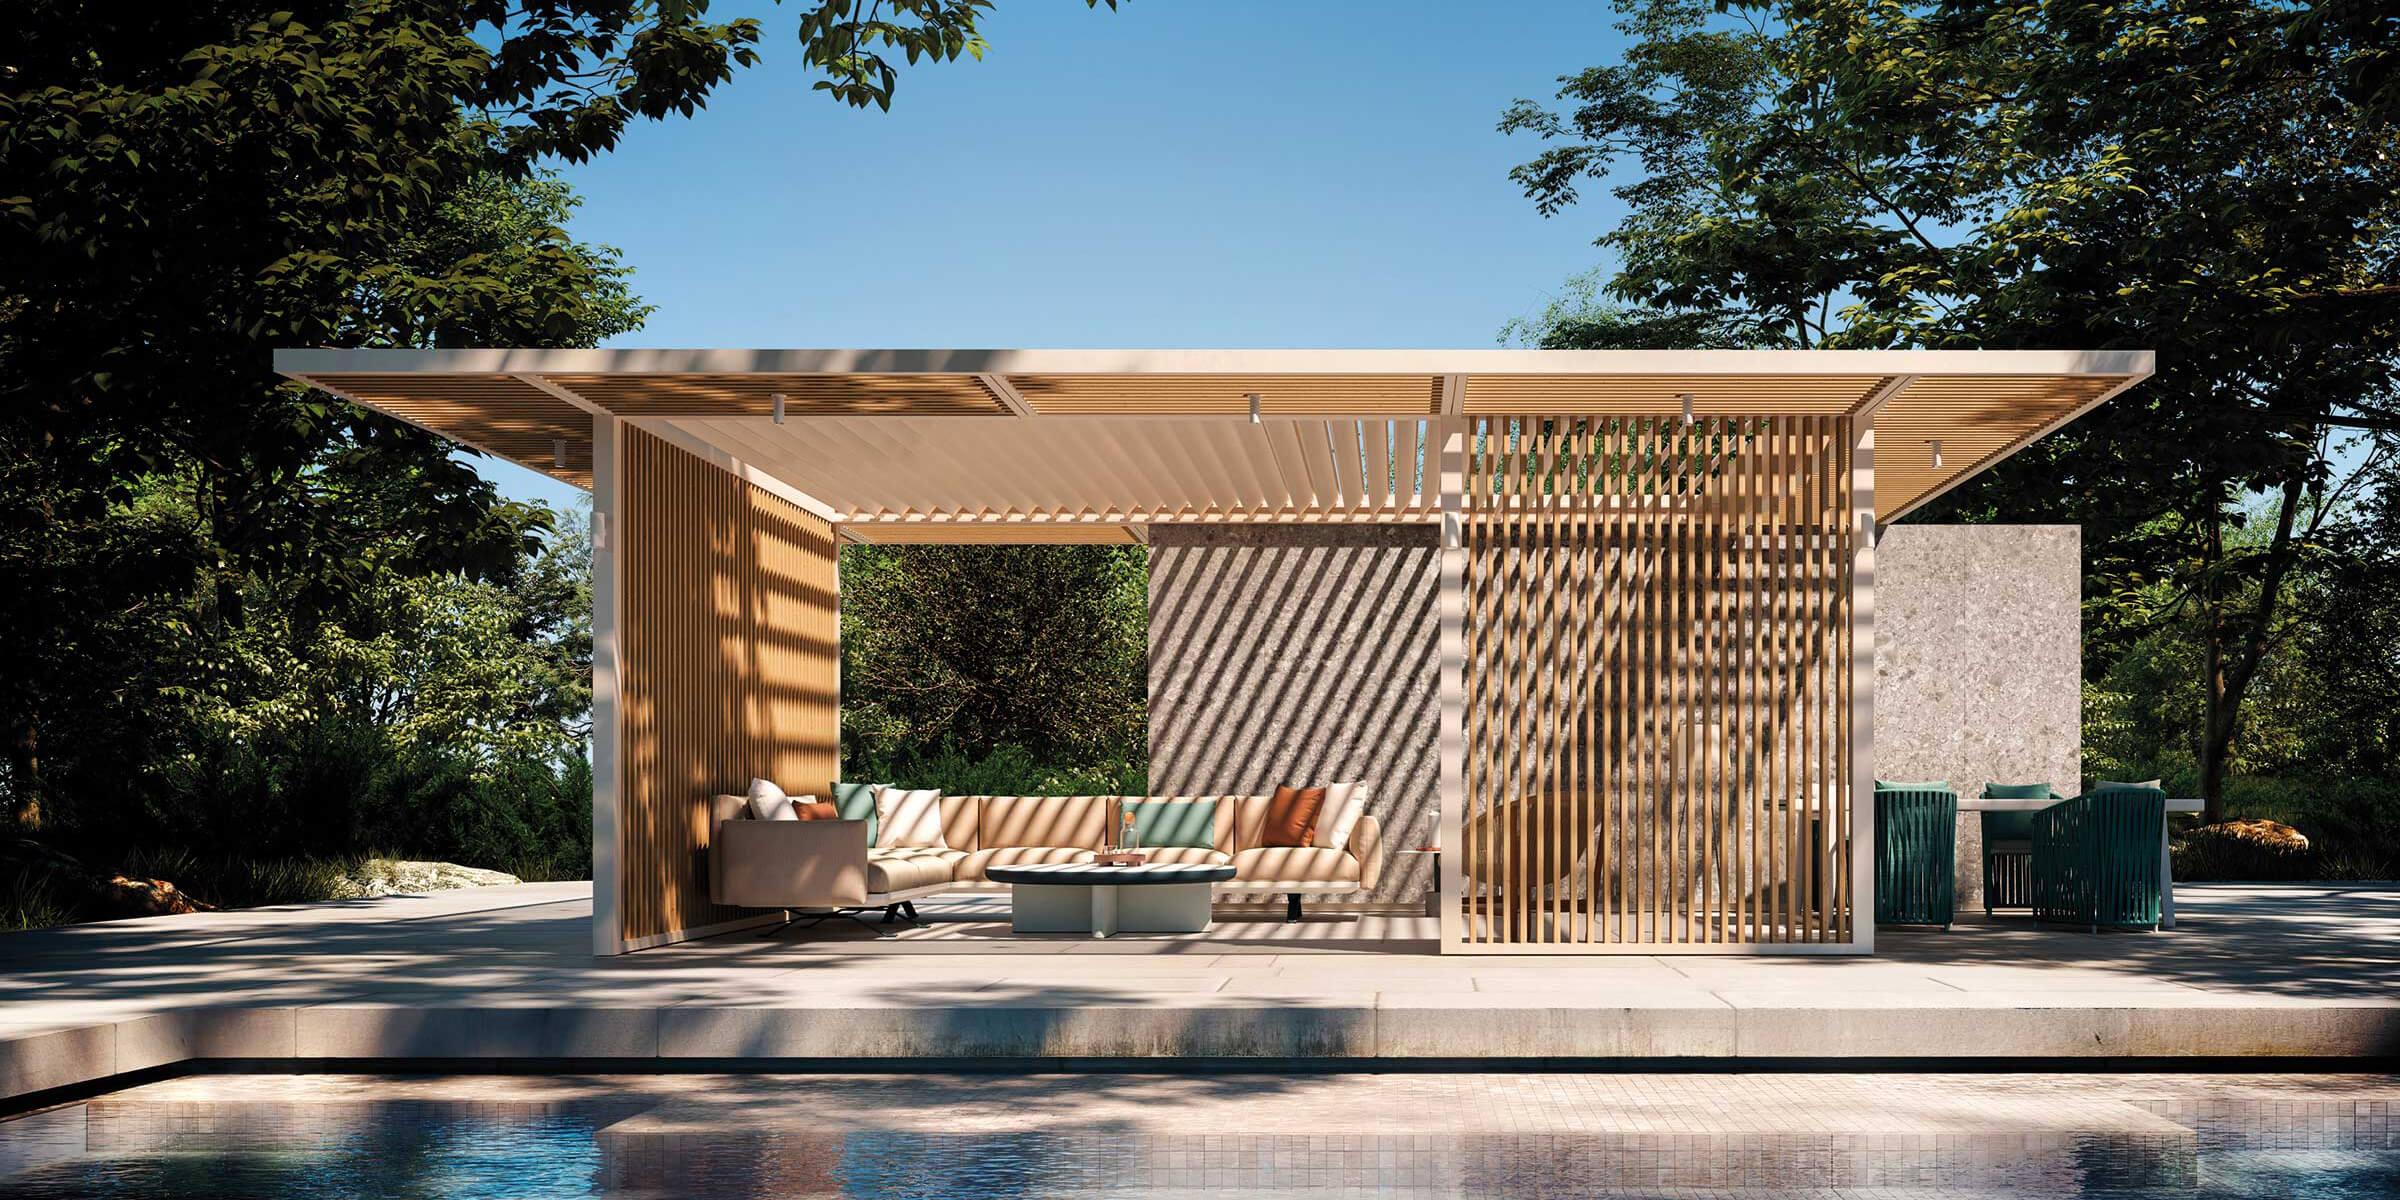 foto_slider_1633_0_pavilion_H_pool_house2_1.jpg